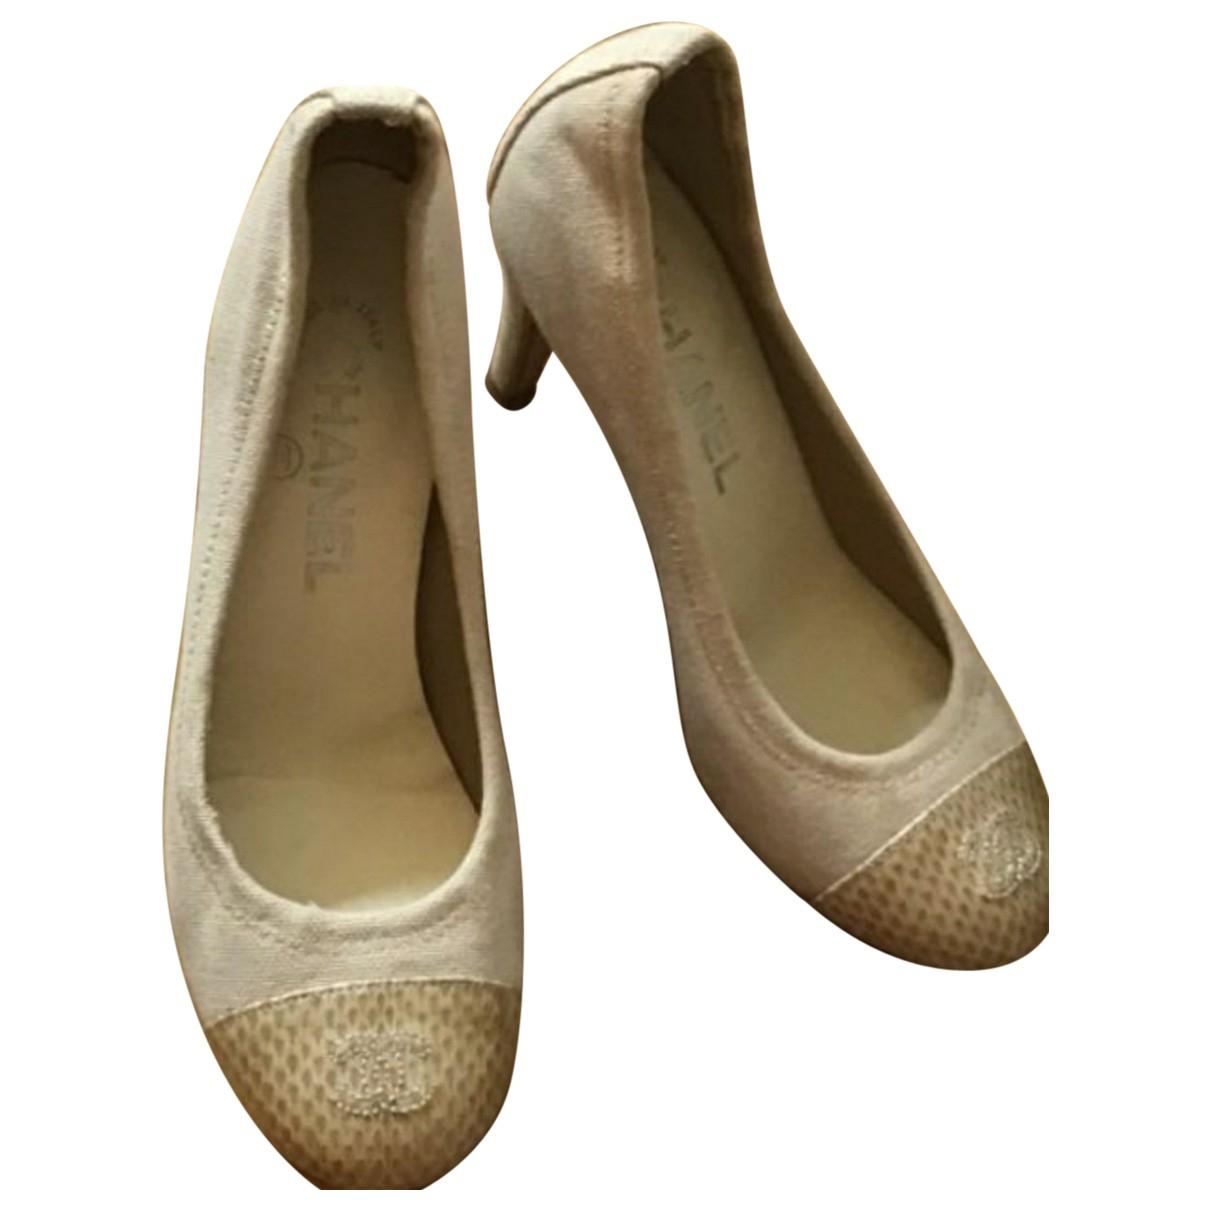 Chanel \N Beige Cloth Flats for Women 36.5 EU